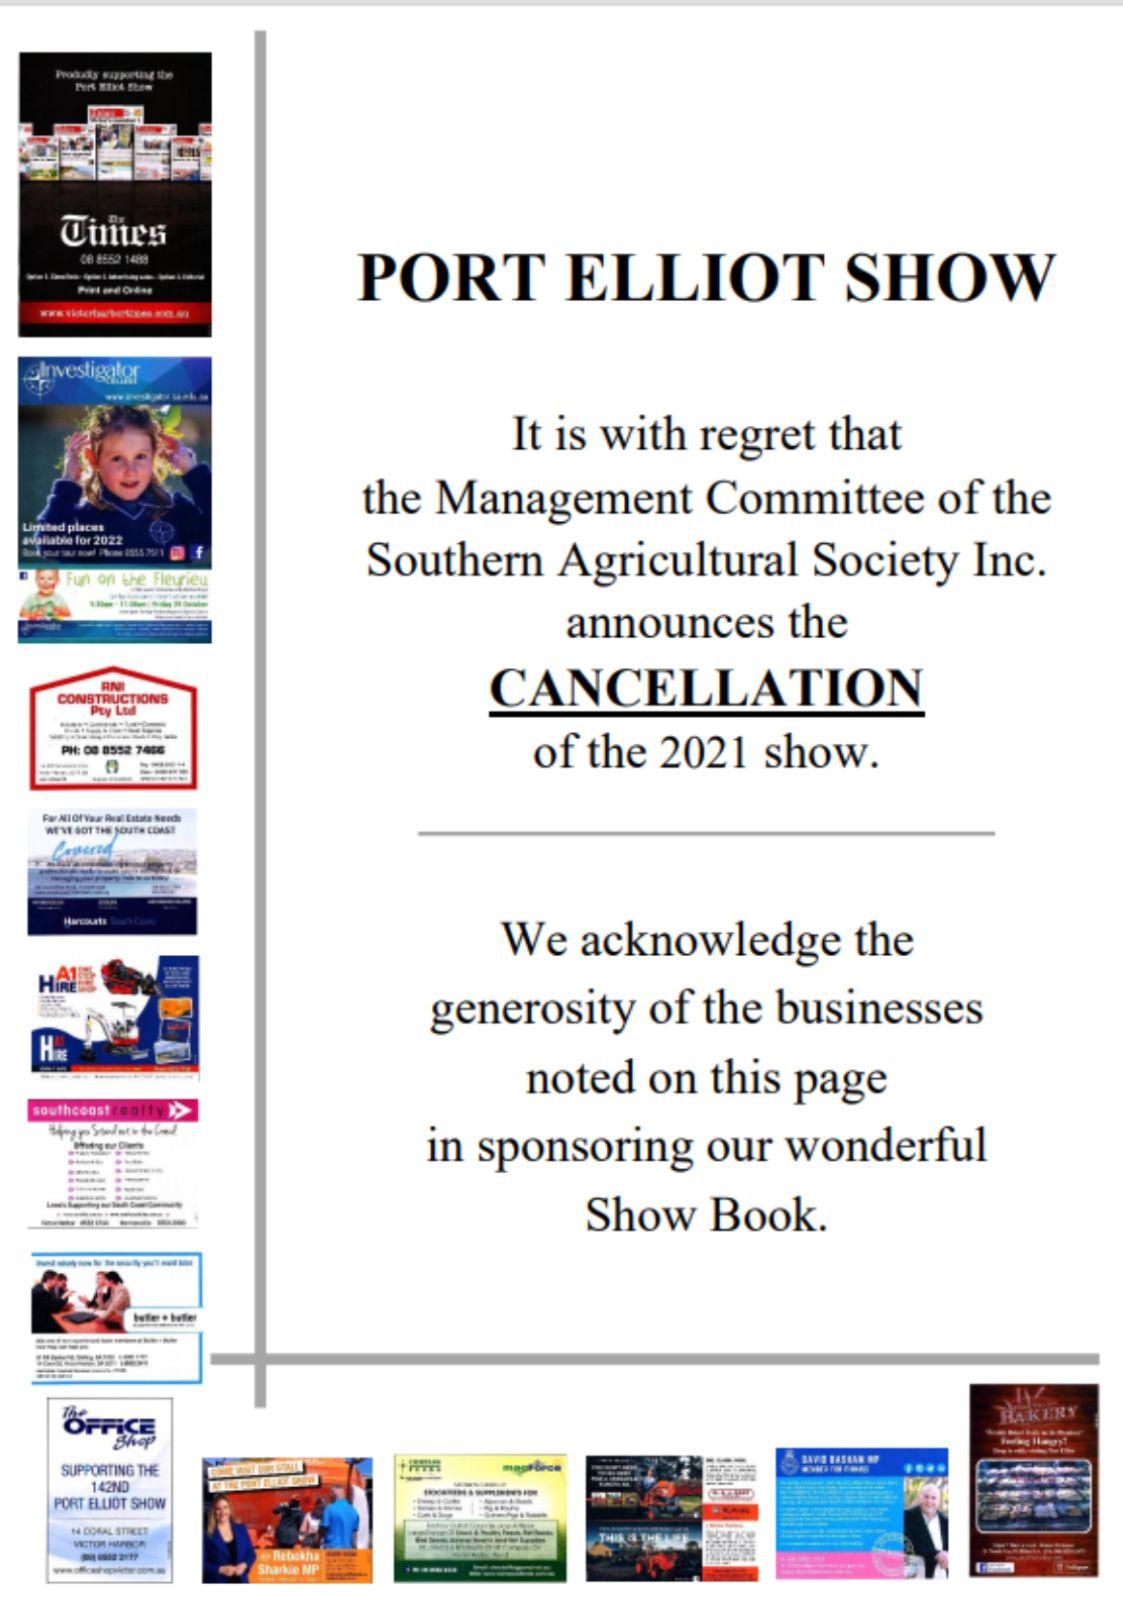 Port Elliot Show